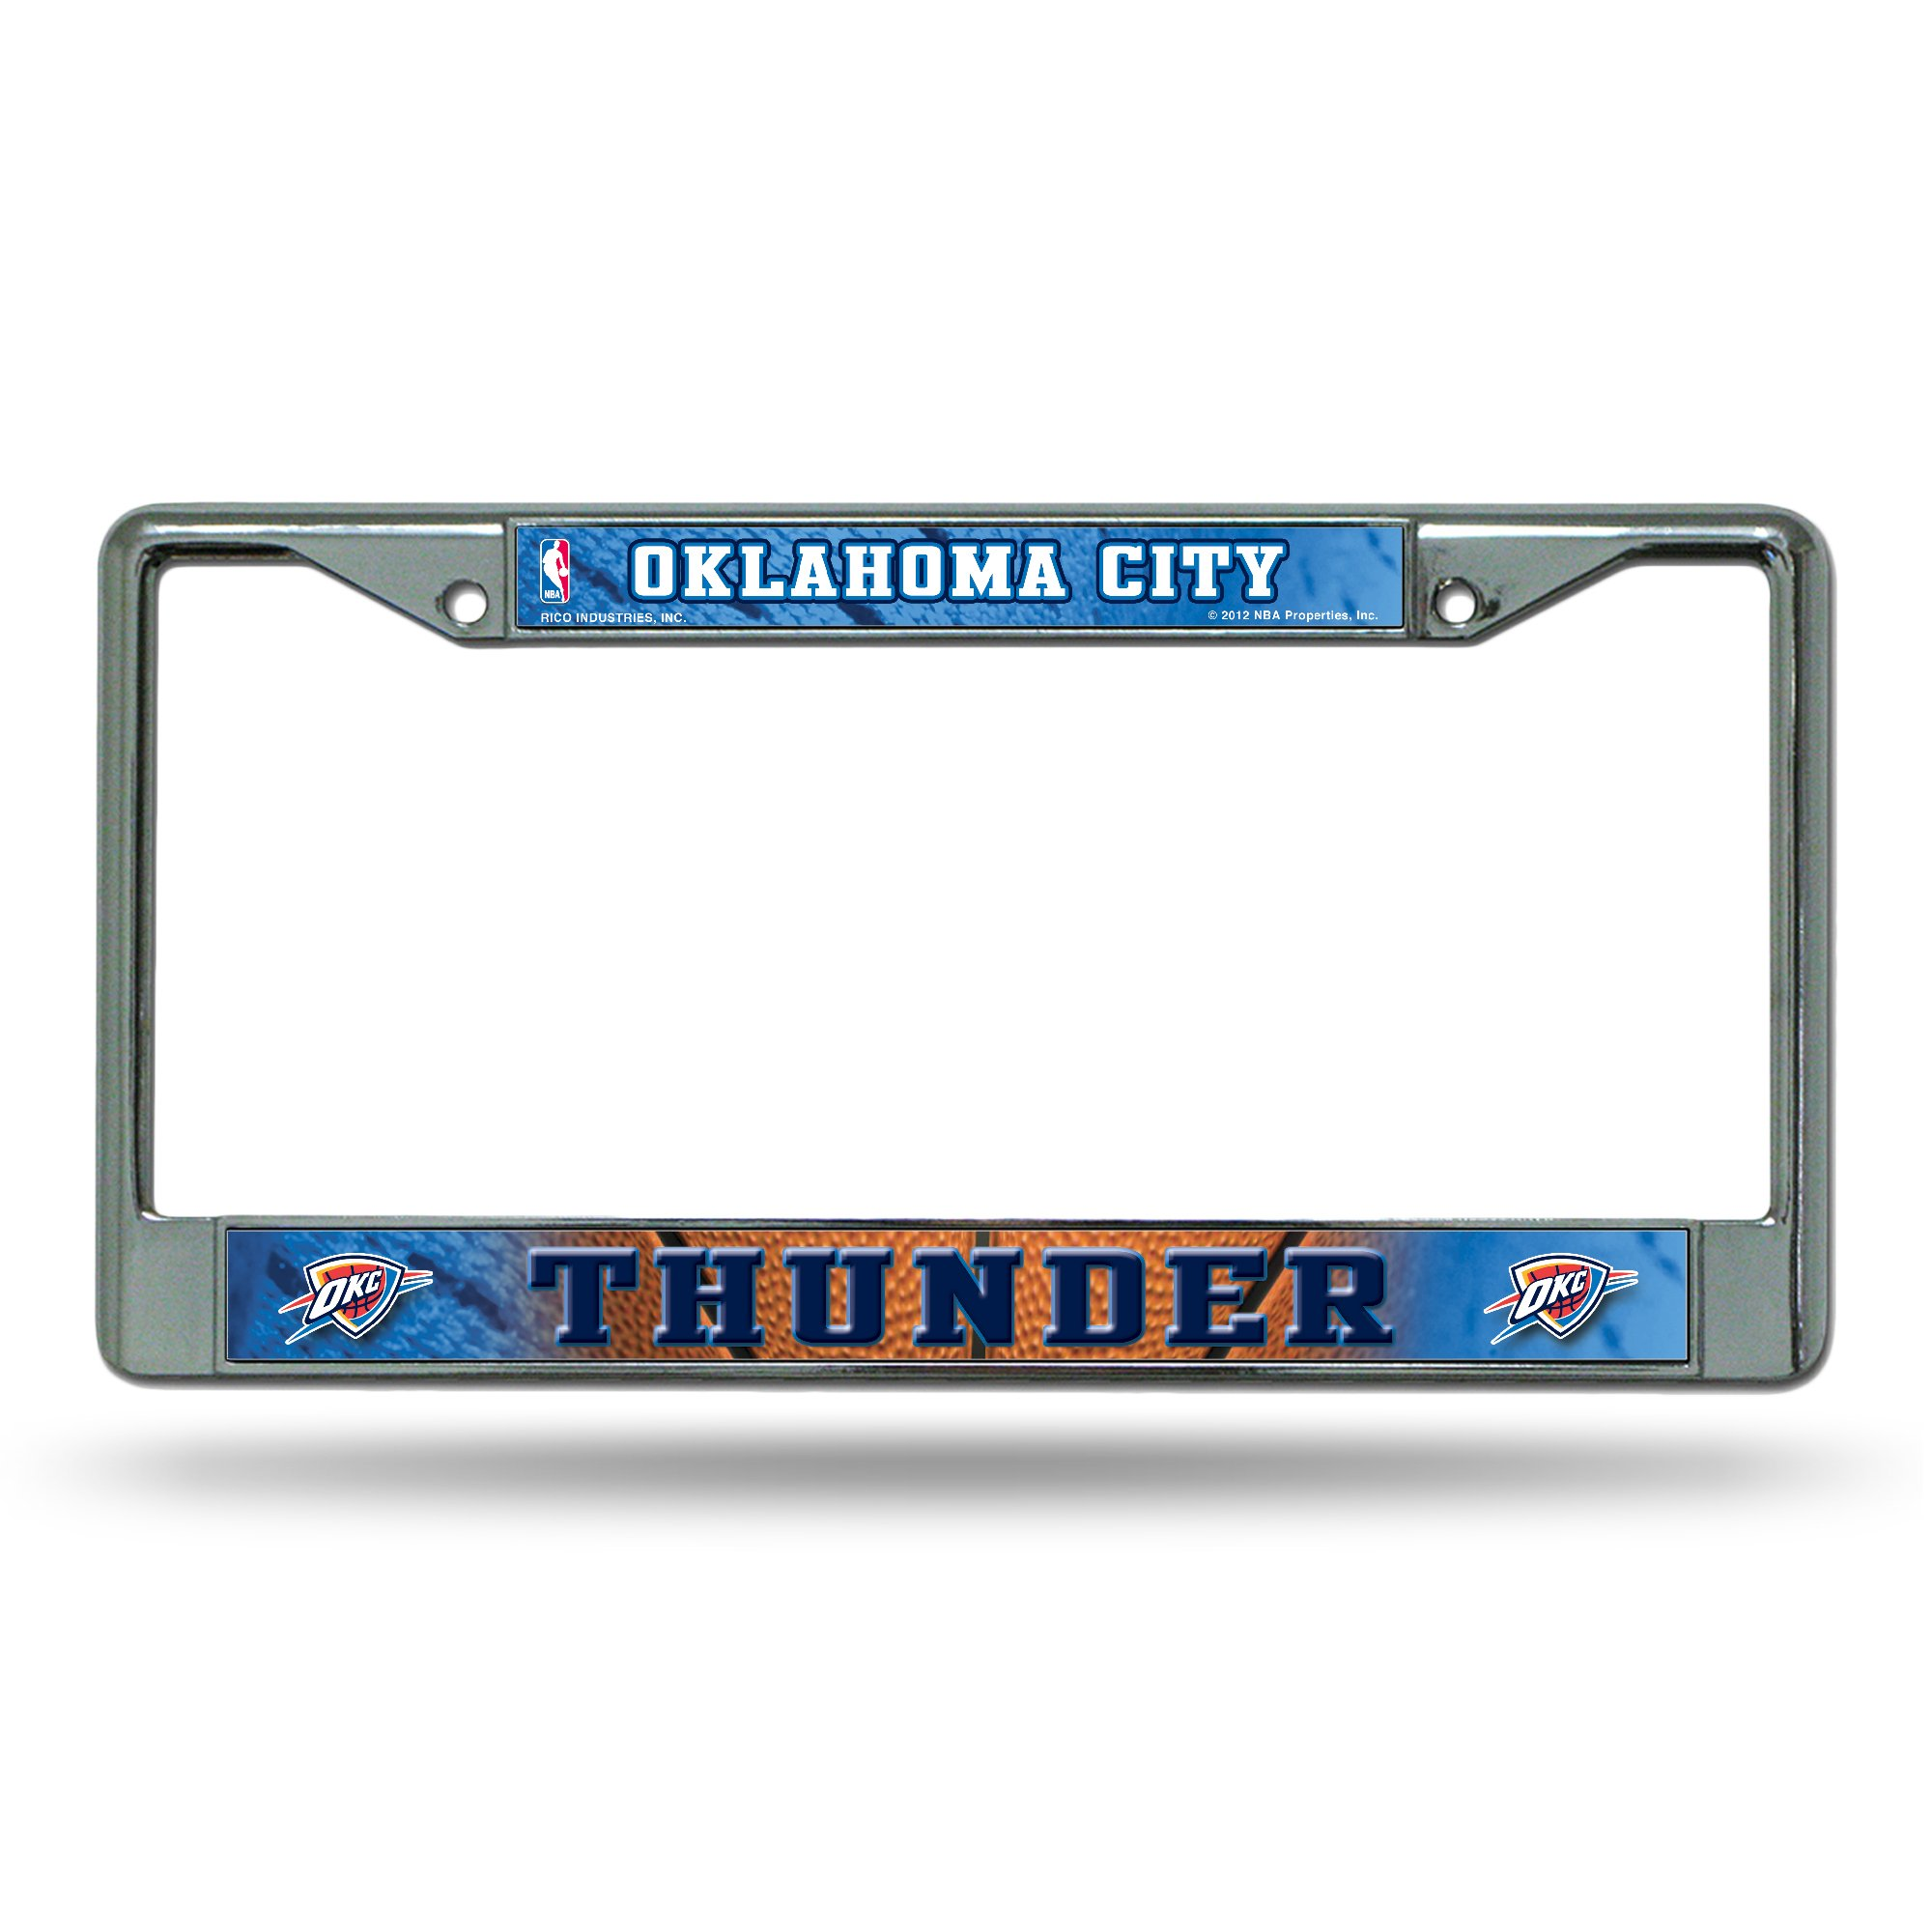 Rico Oklahoma City Thunder NBA Chrome Metal License Plate Frame